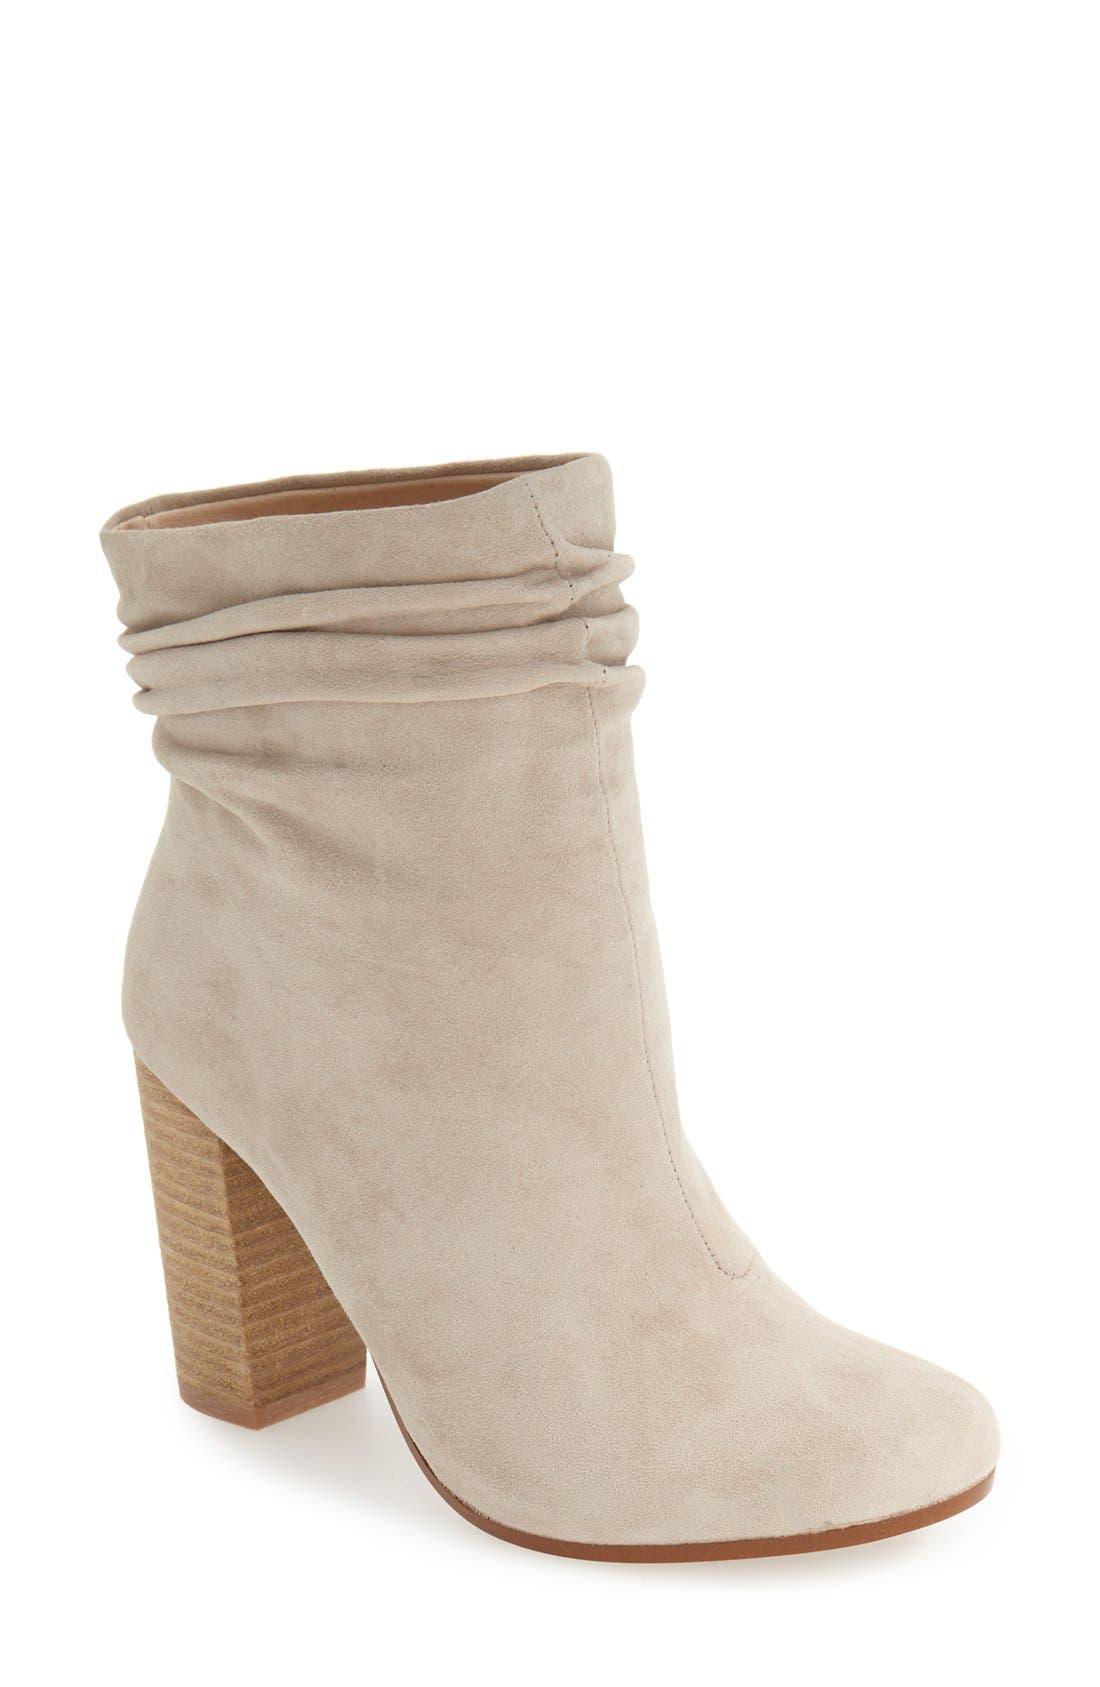 Kristin Cavallari 'Georgie' Block Heel Boot (Women)